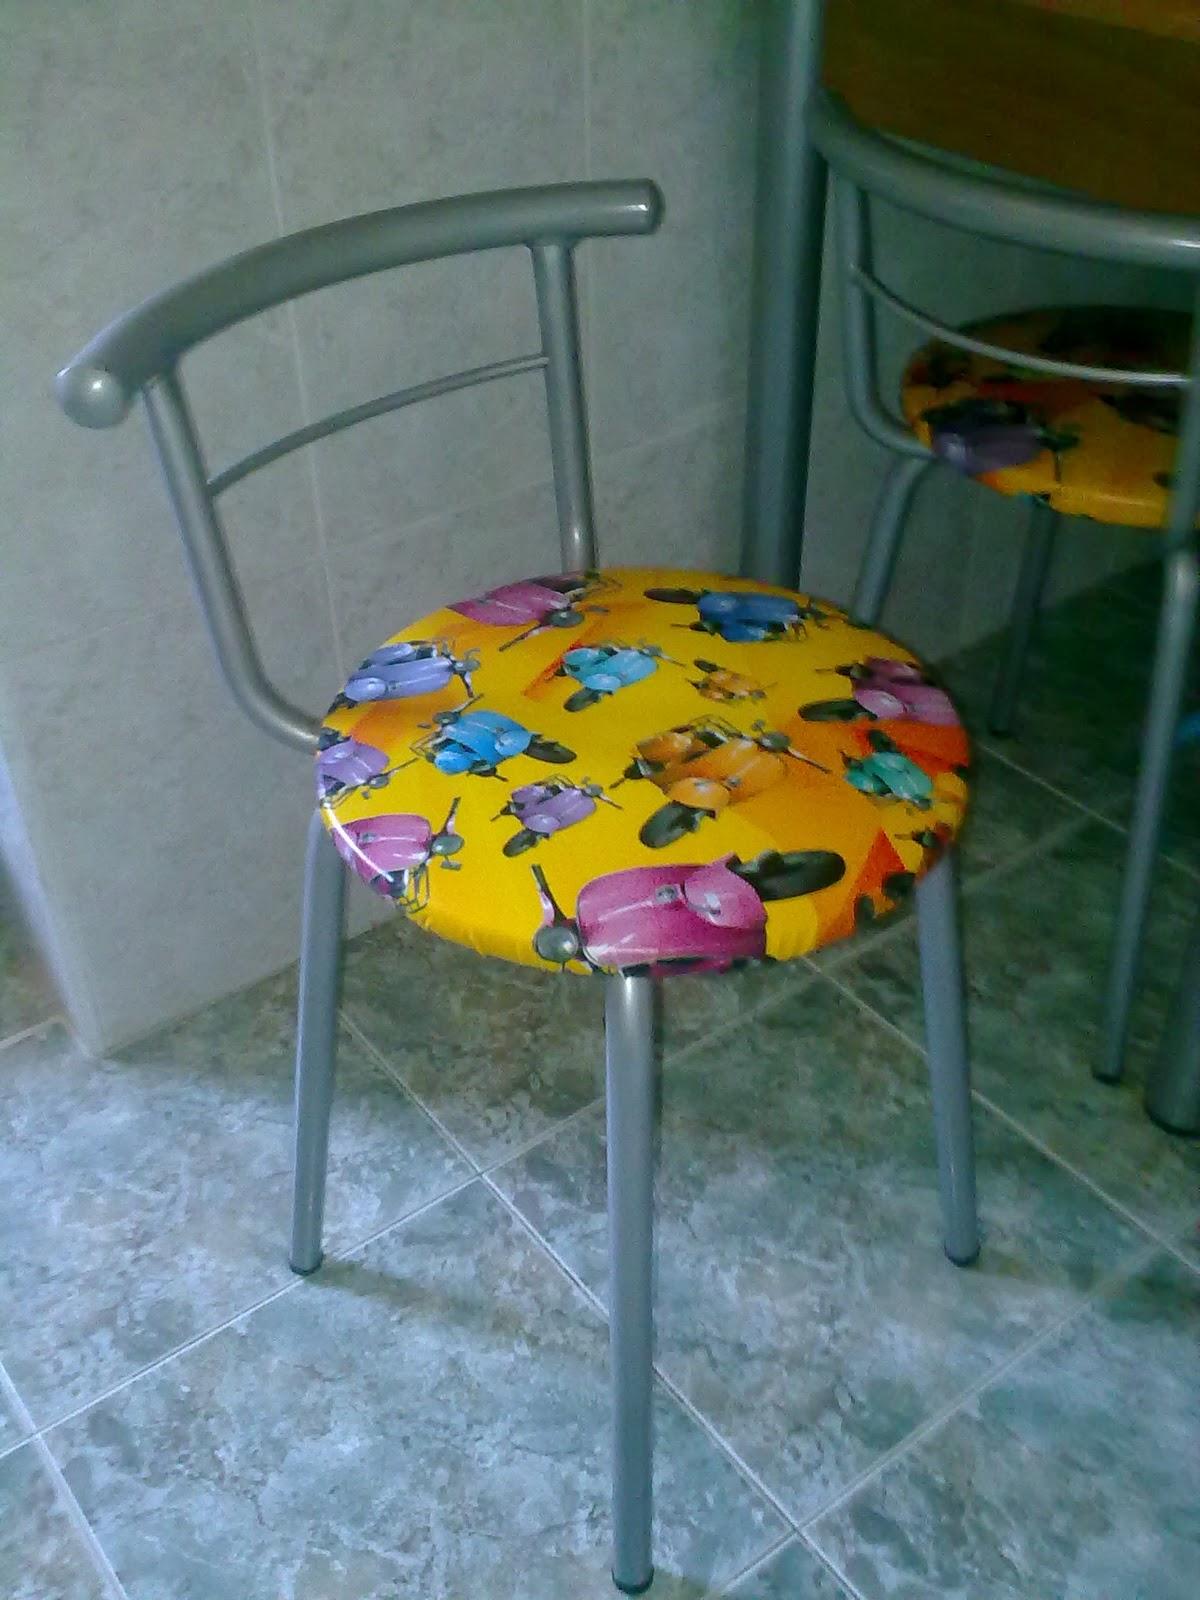 Decoro sin decoro tapizar sillas a prueba de ni os - Telas tapizar sillas ...